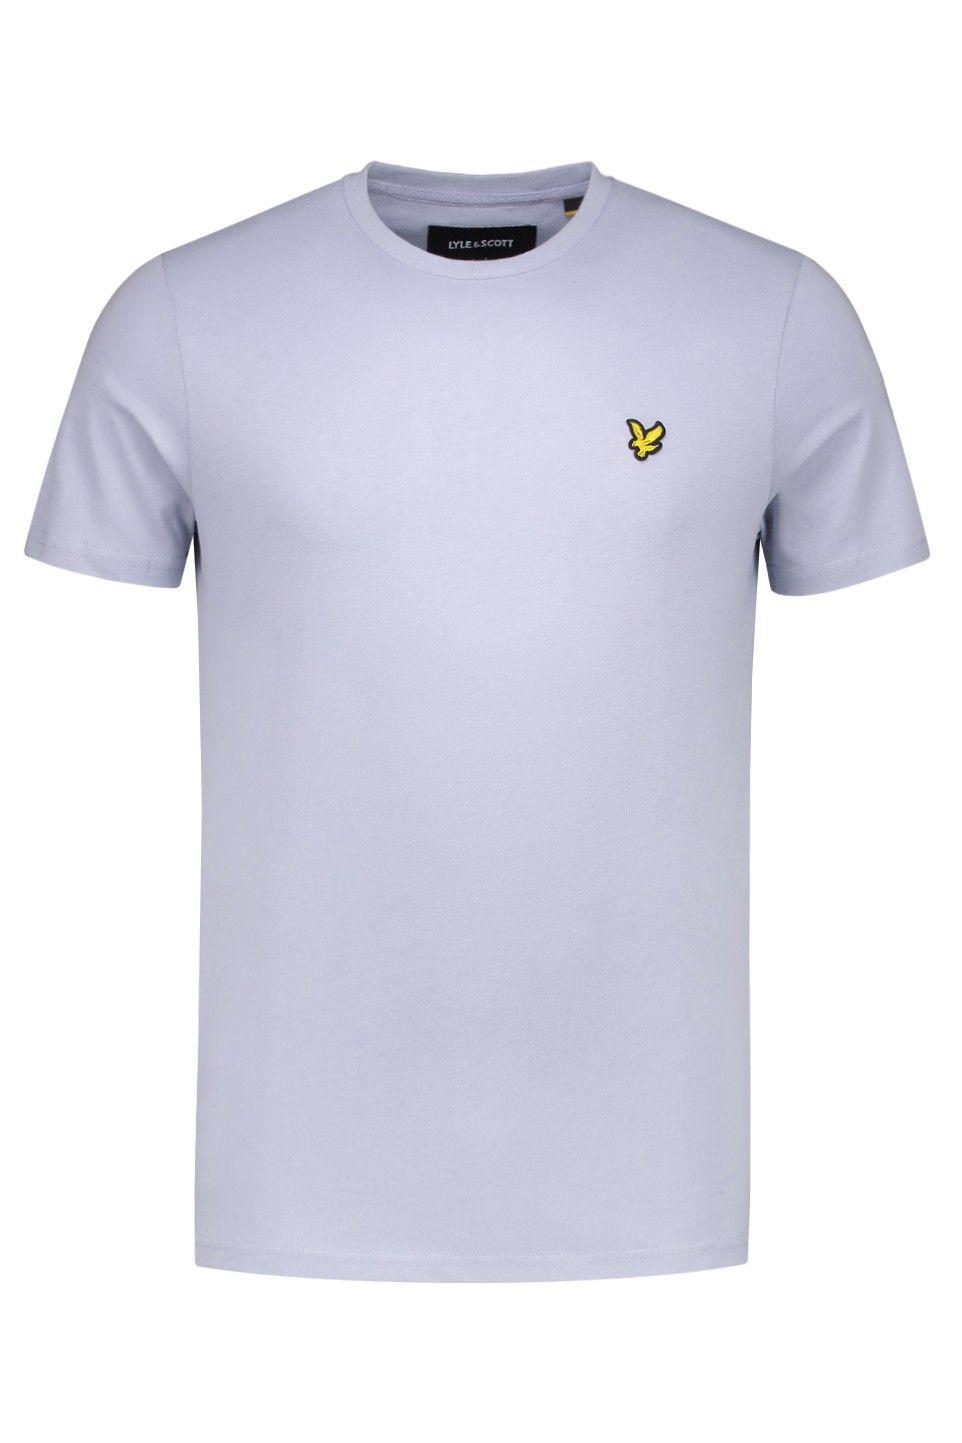 Lyle /& Scott Mens T Shirt TS400V